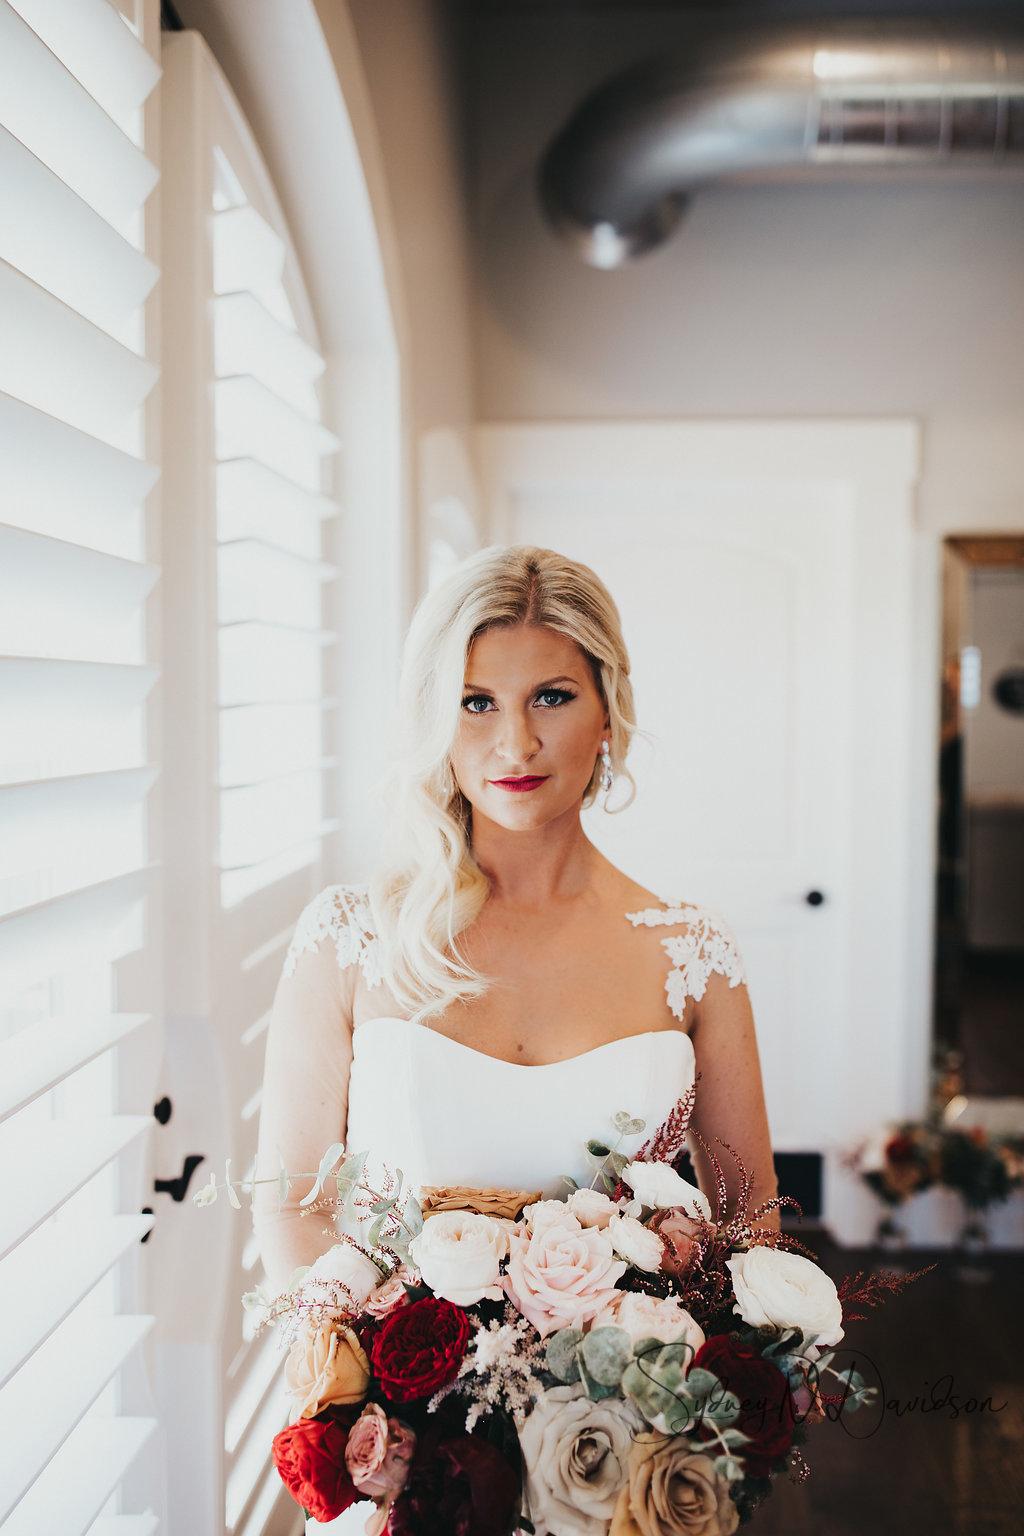 sydney-davidson-wedding-stillwater-oklahoma-wedding-session-traveling-photographer-portrait-tulsa-oklahoma-1773.jpg